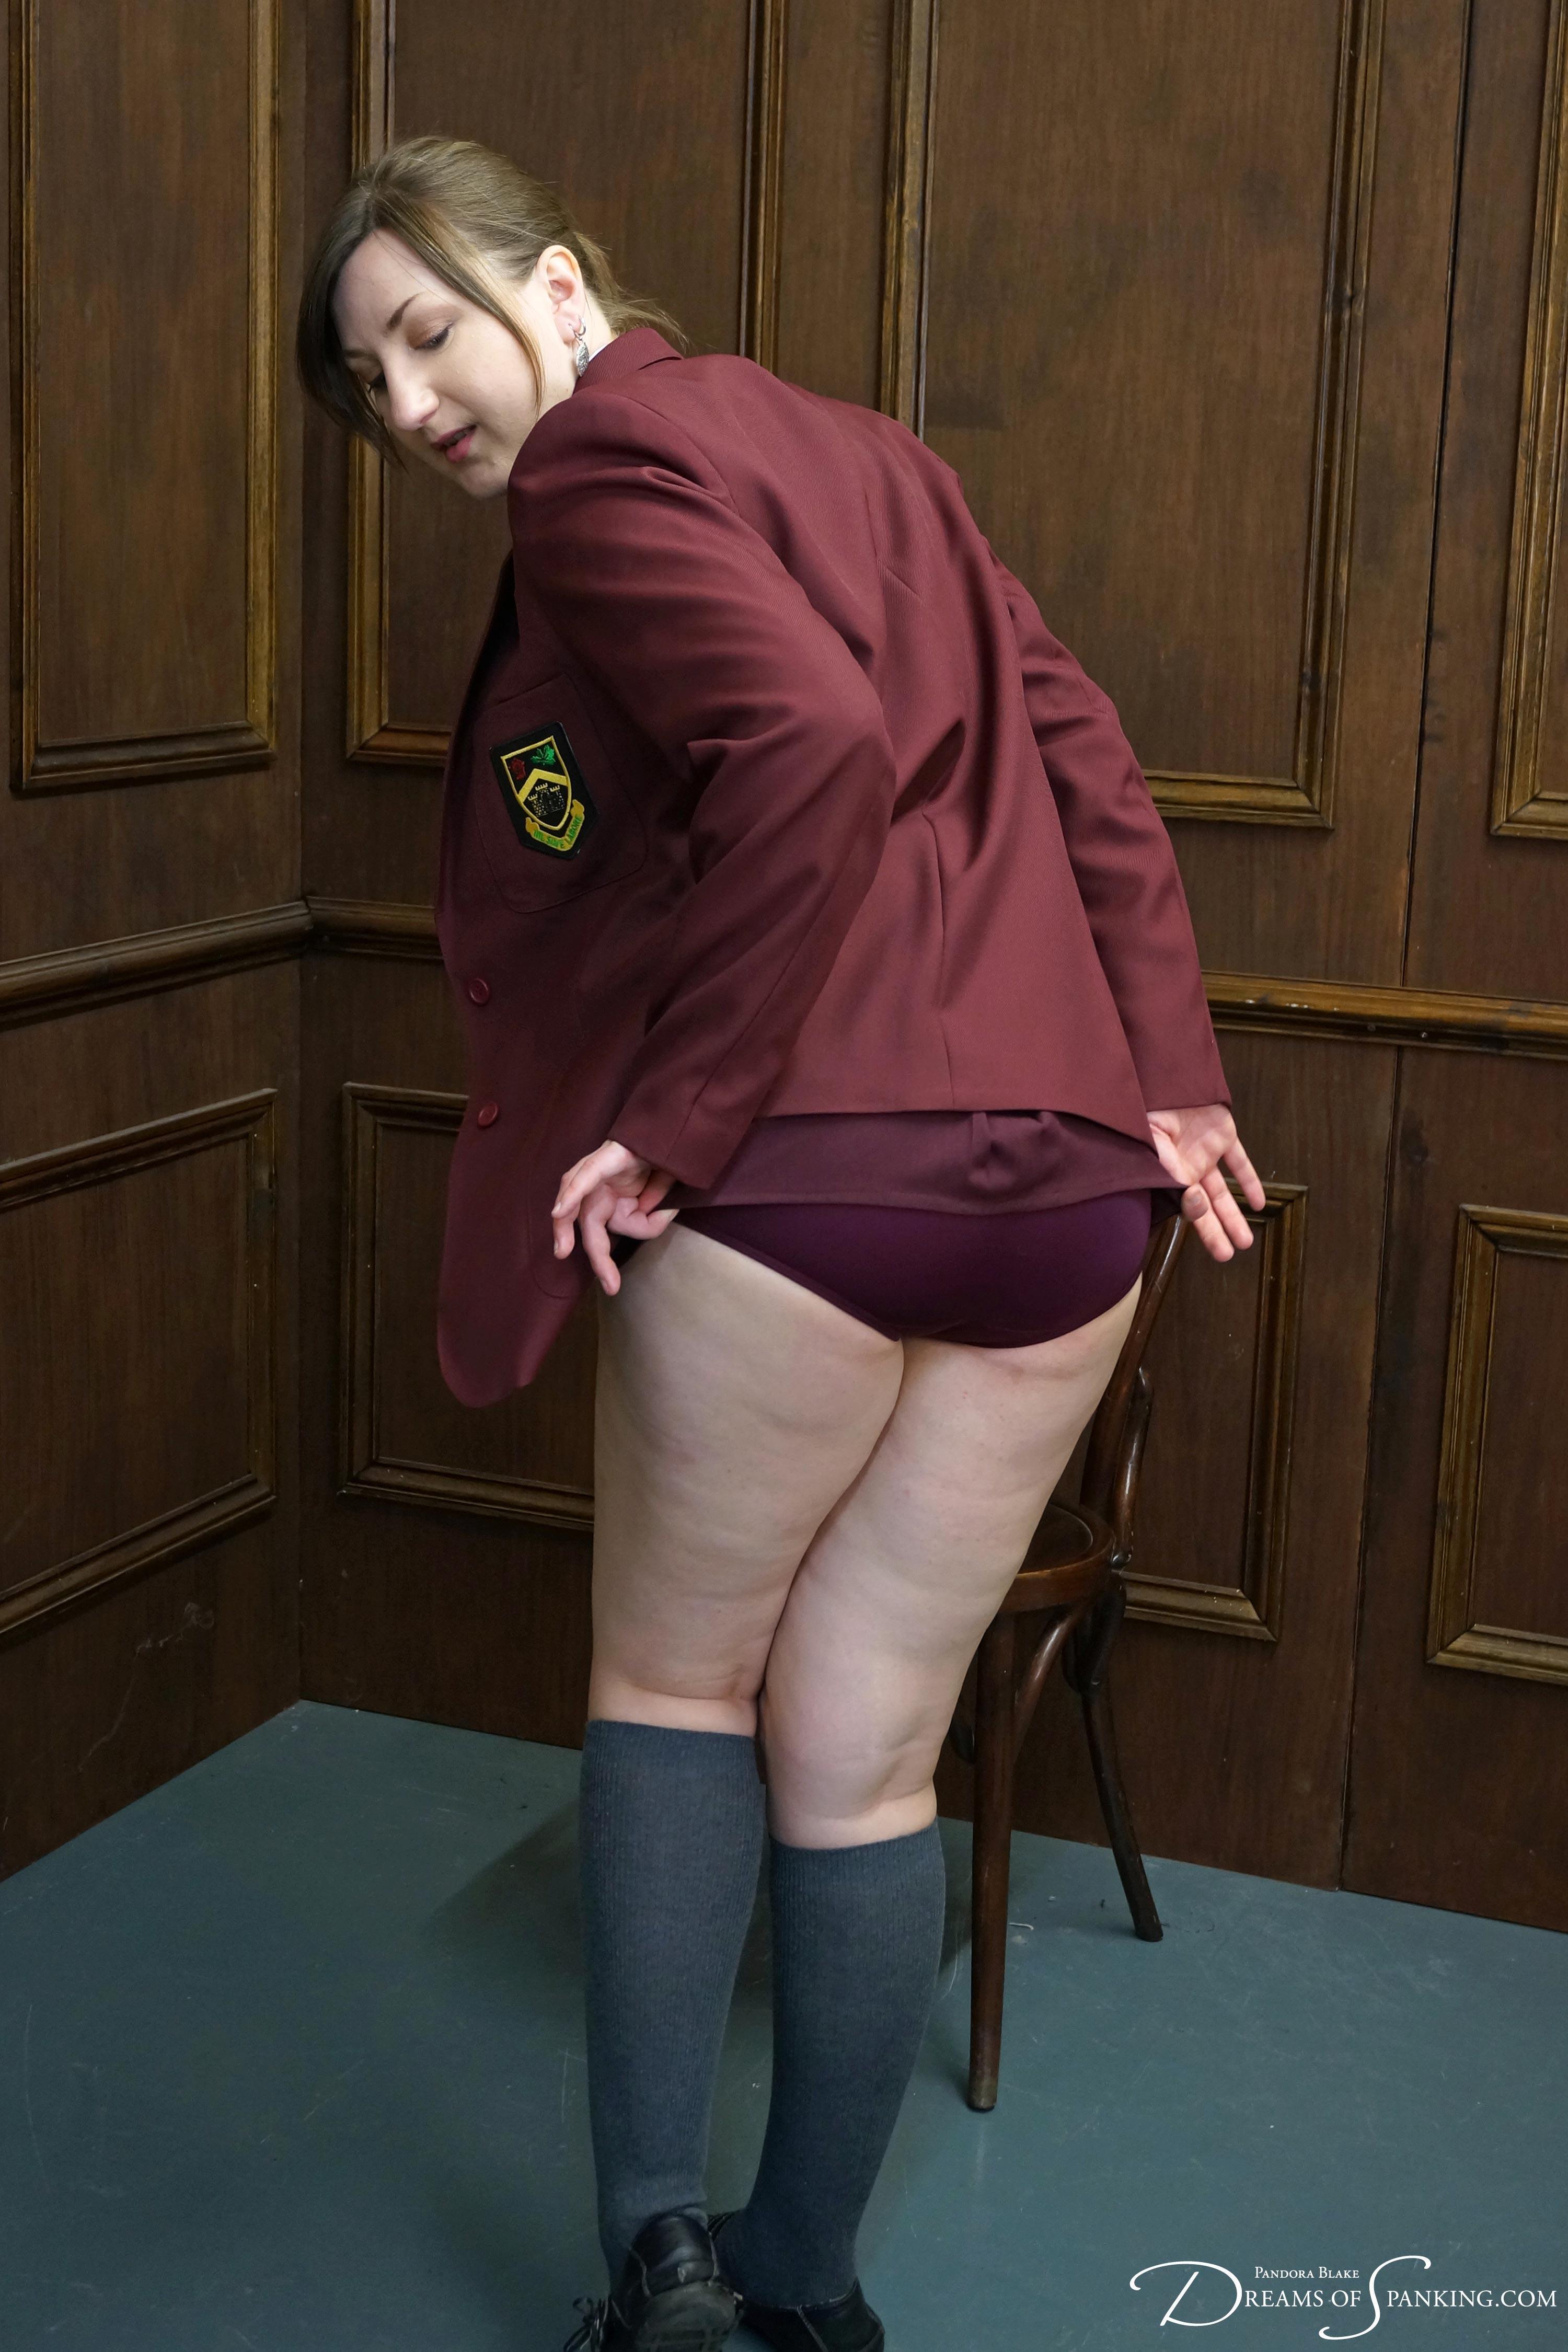 Spank over skirts